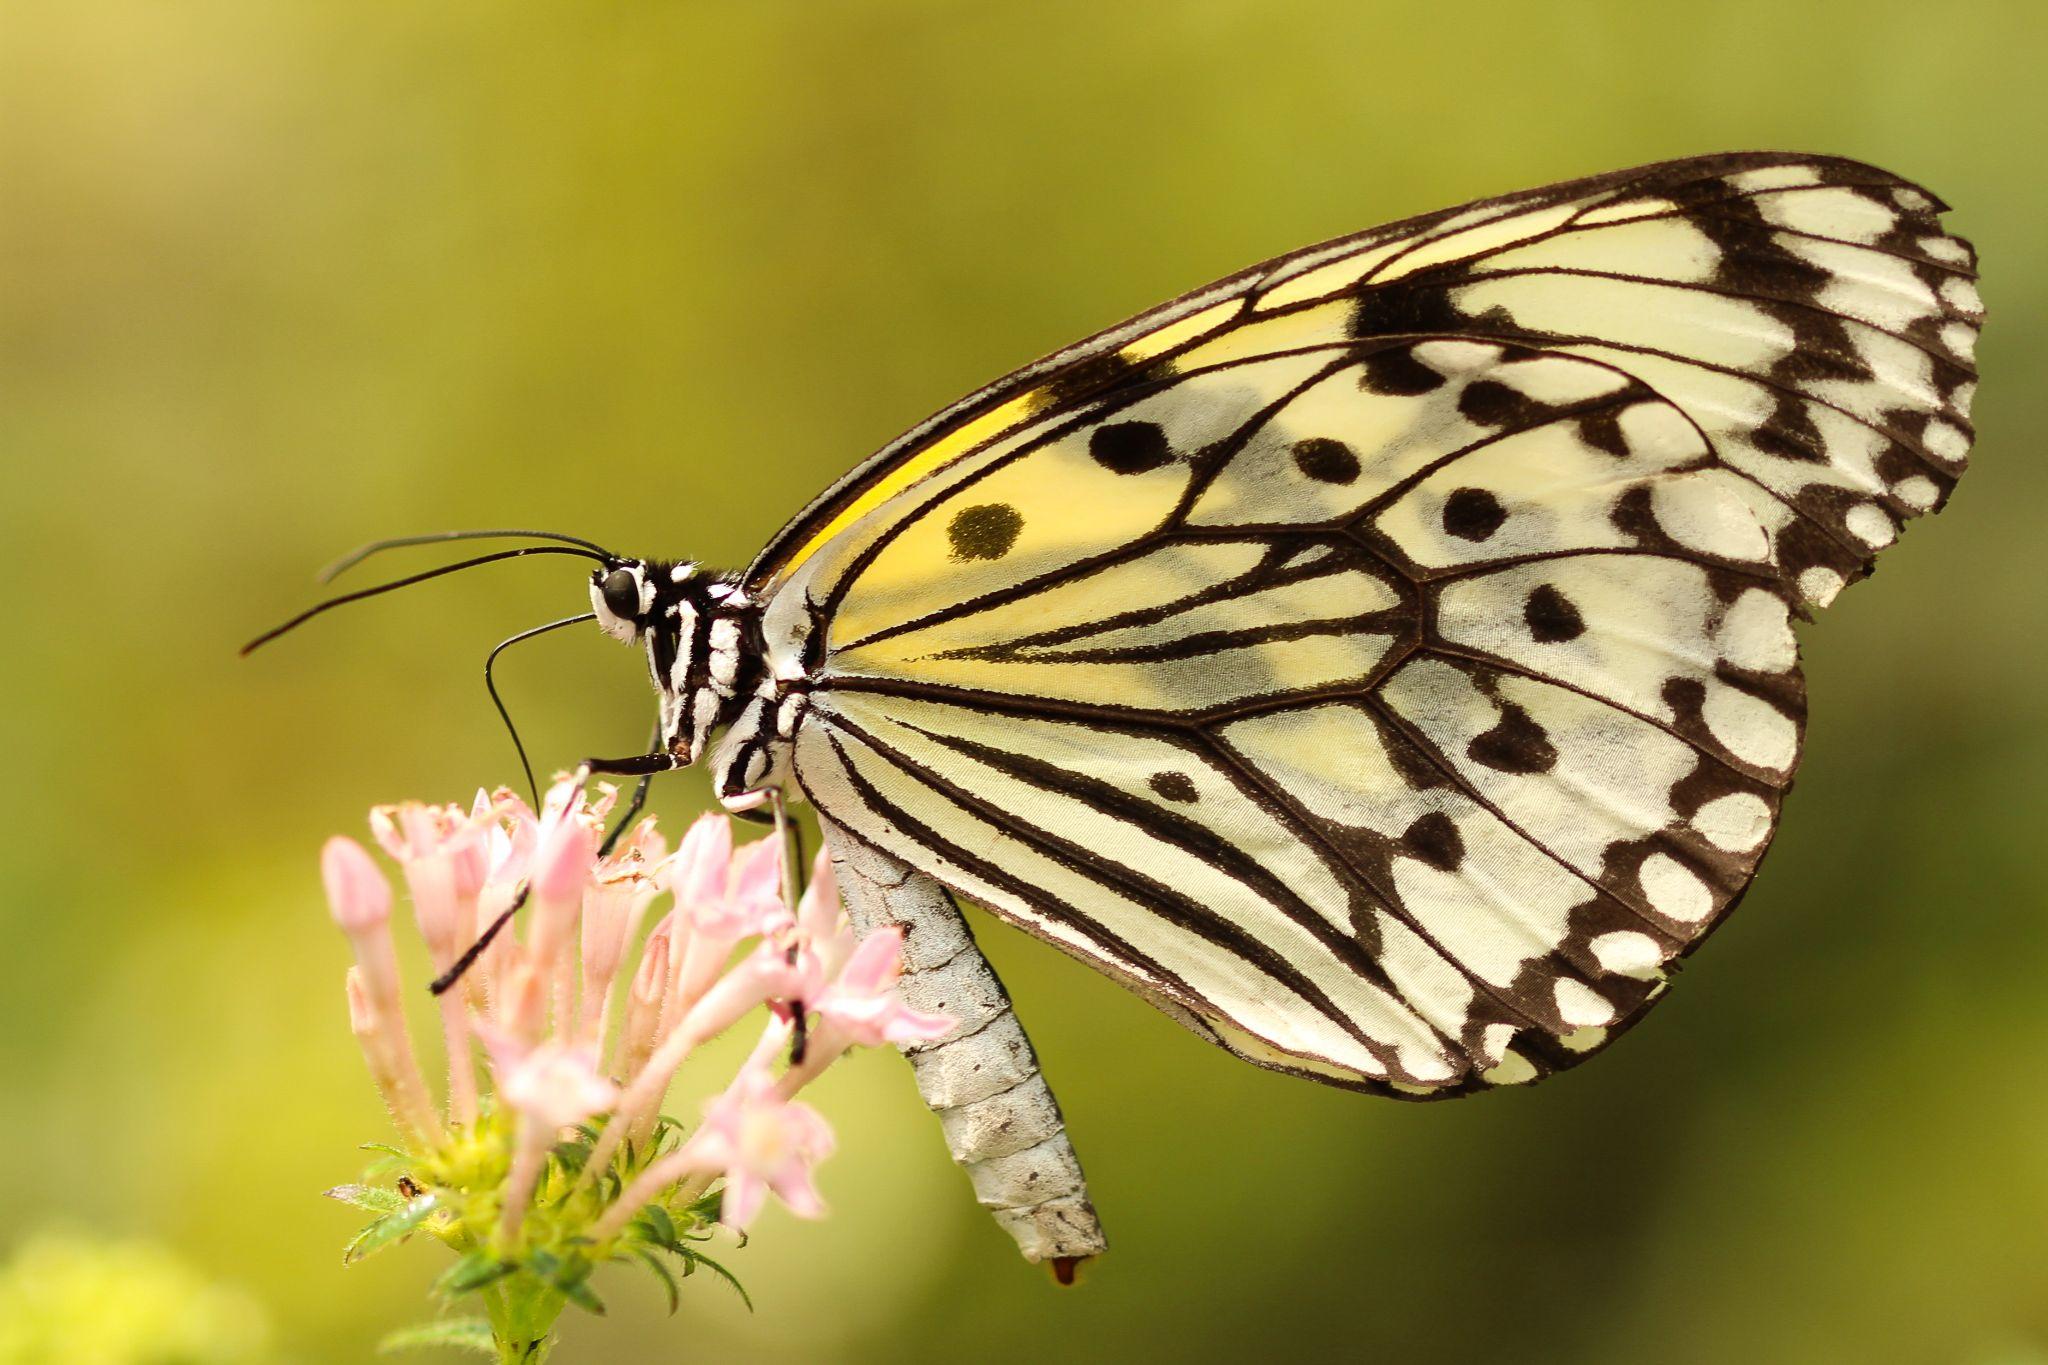 The new butterfly season by boris.smokrovic